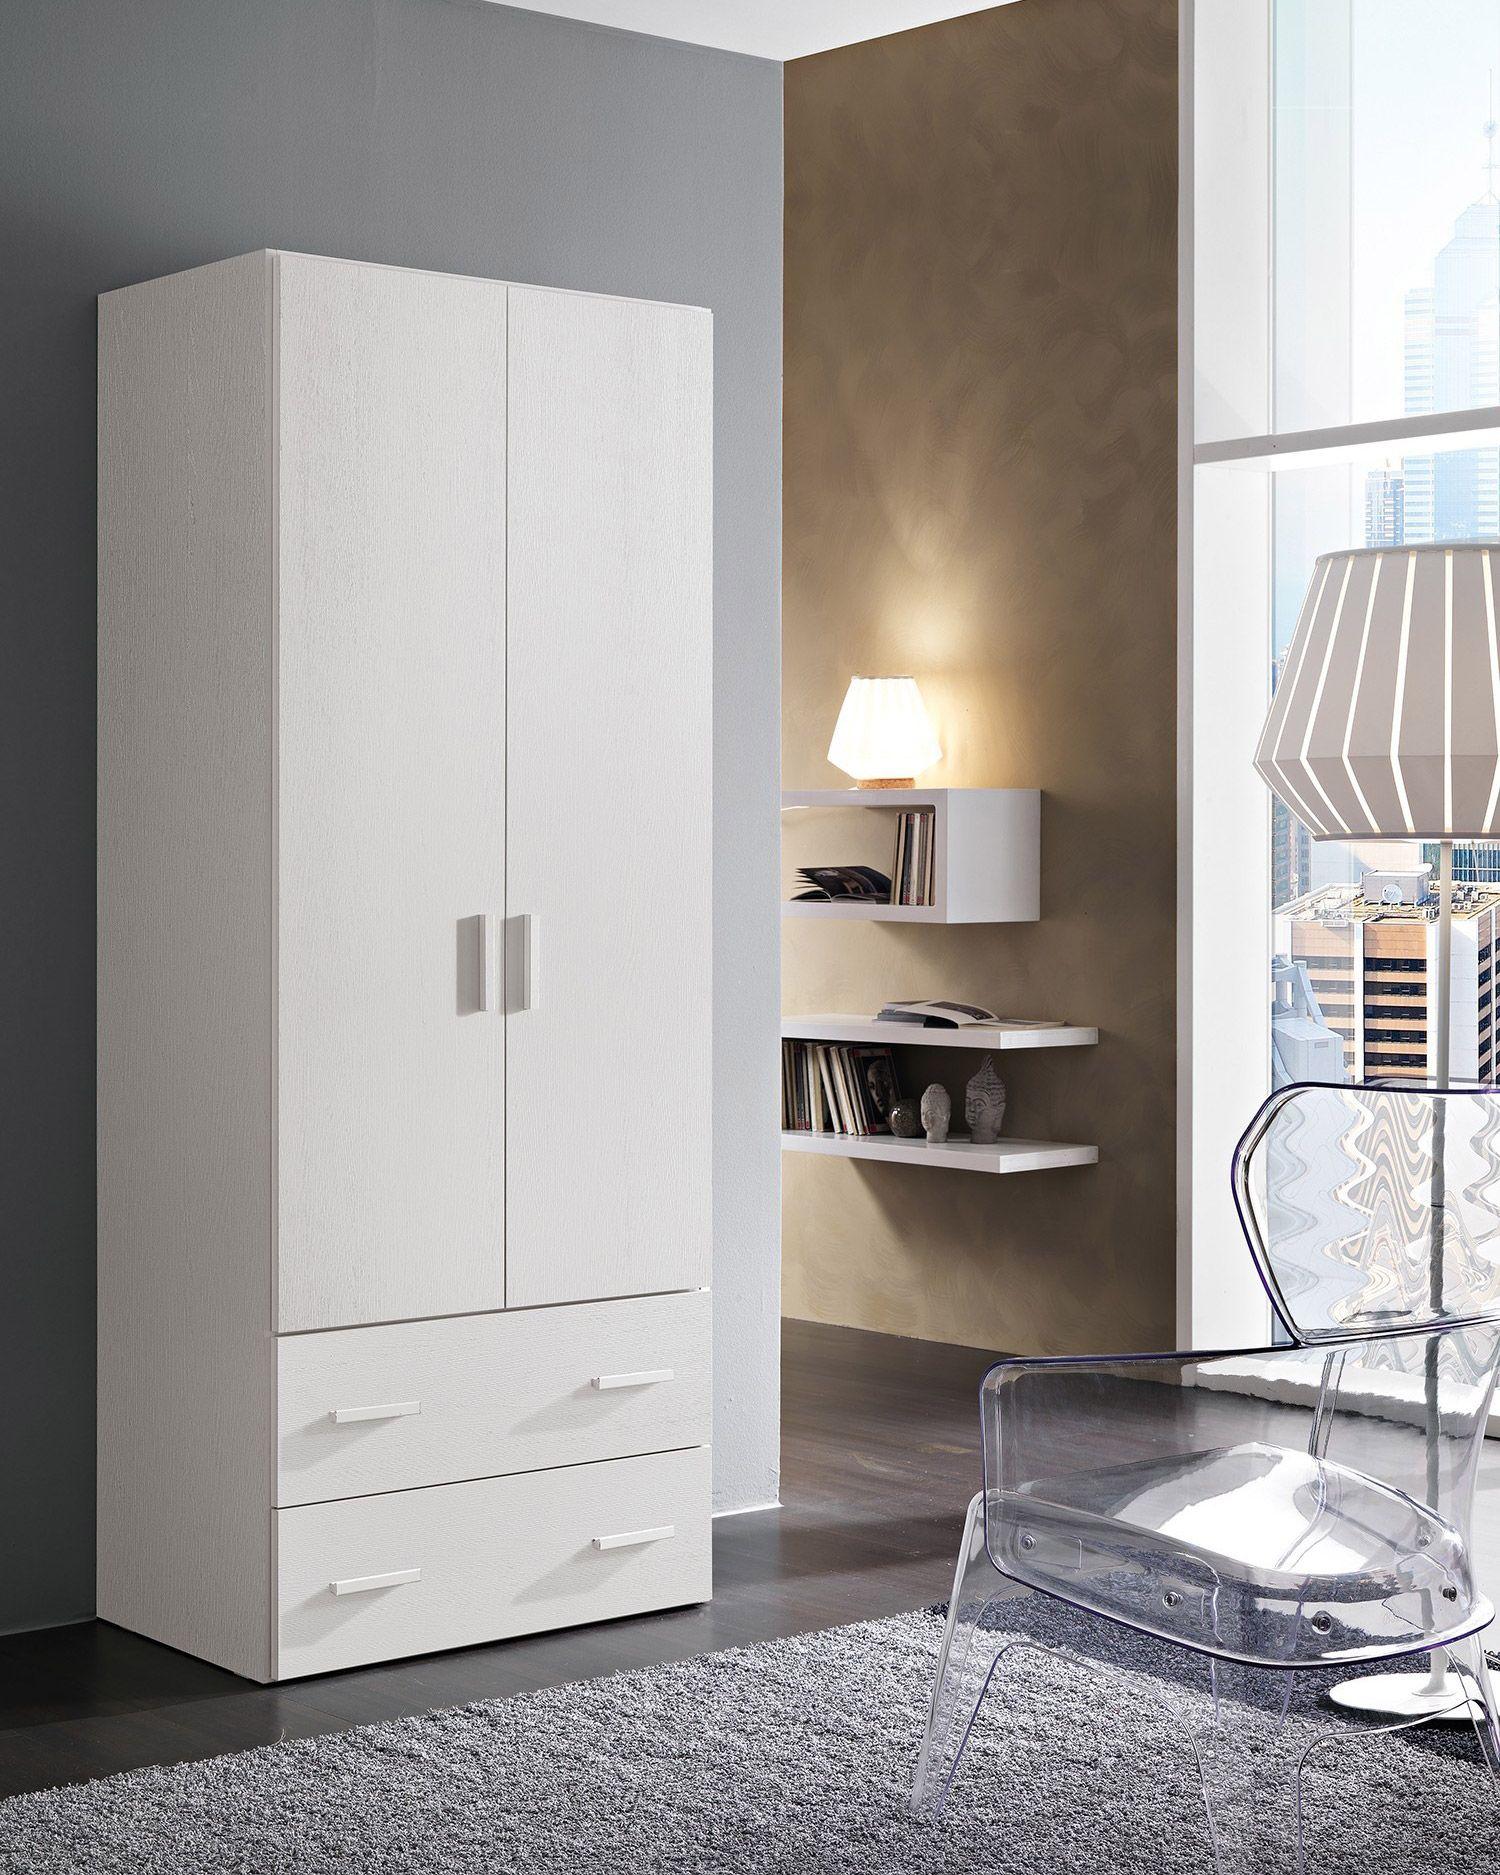 Vendita mobili online - armadio cassetti bianco frassino ...